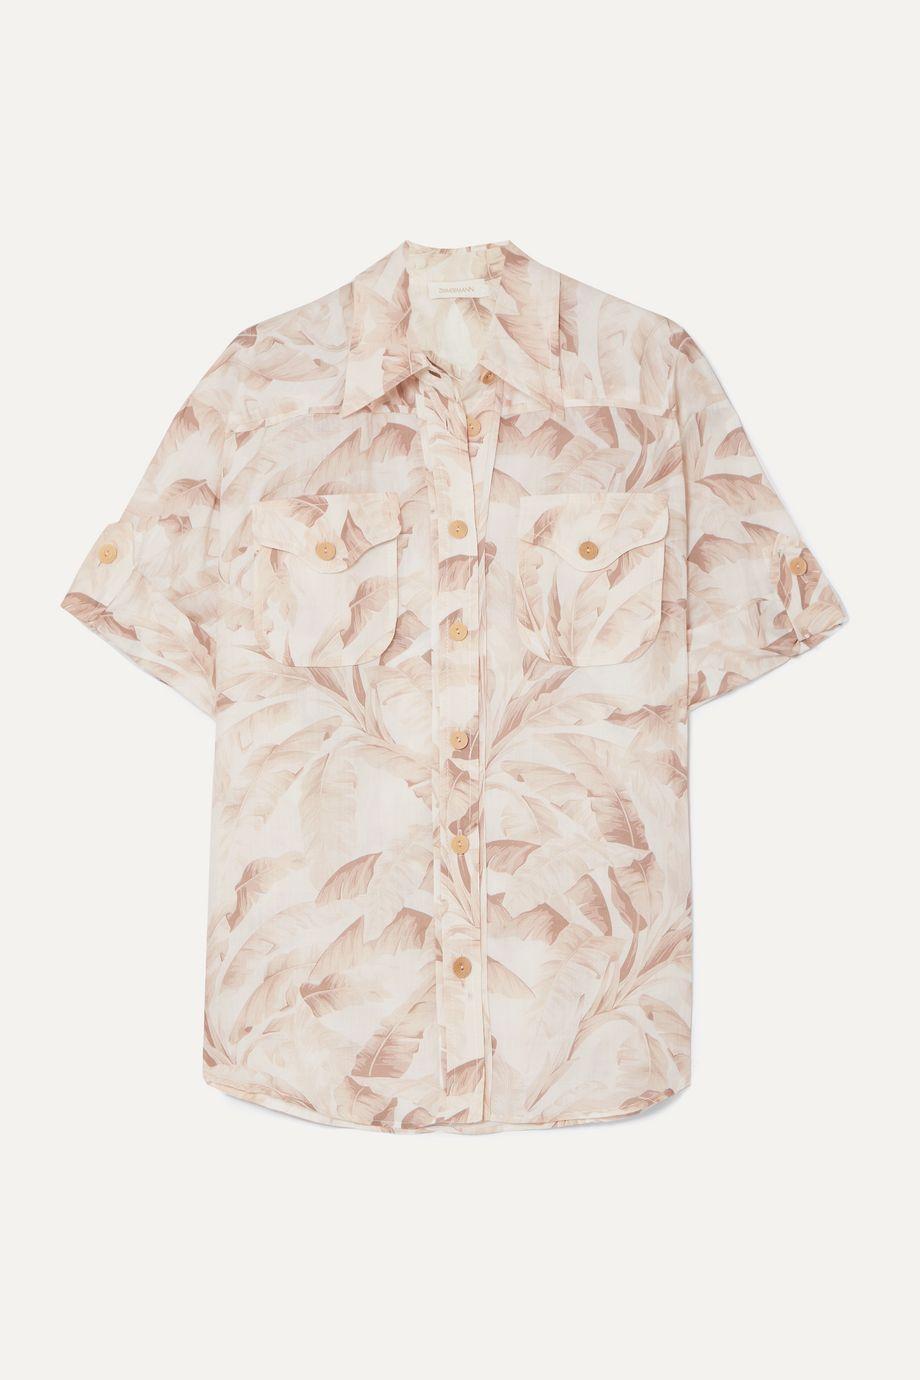 Zimmermann Super Eight printed ramie shirt